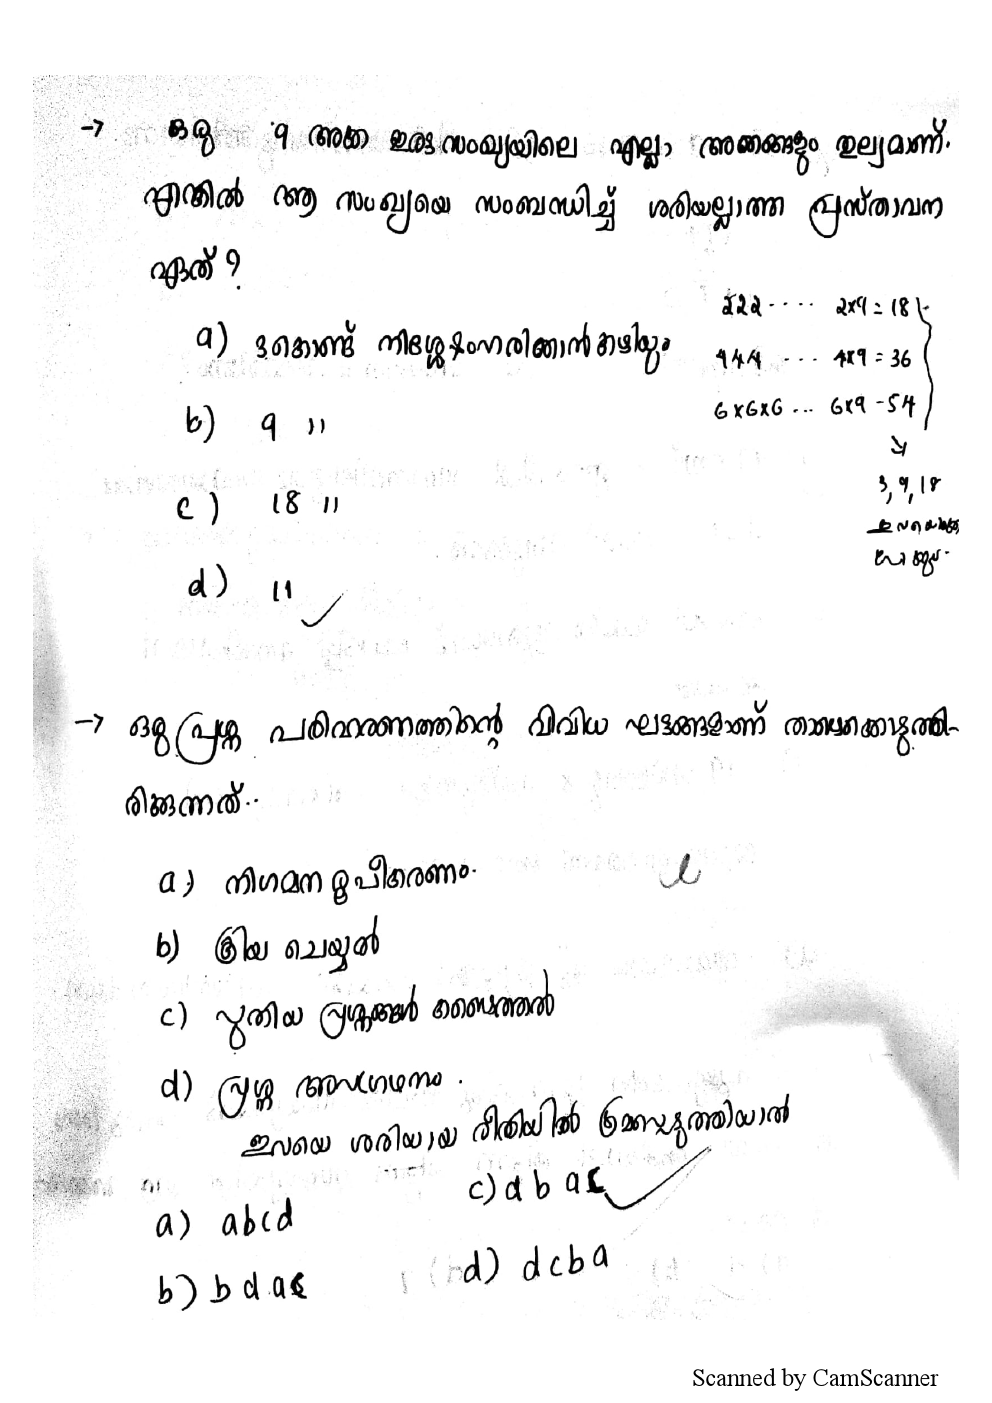 http://masterstudy.net/pdf/ktet_notes0026.png